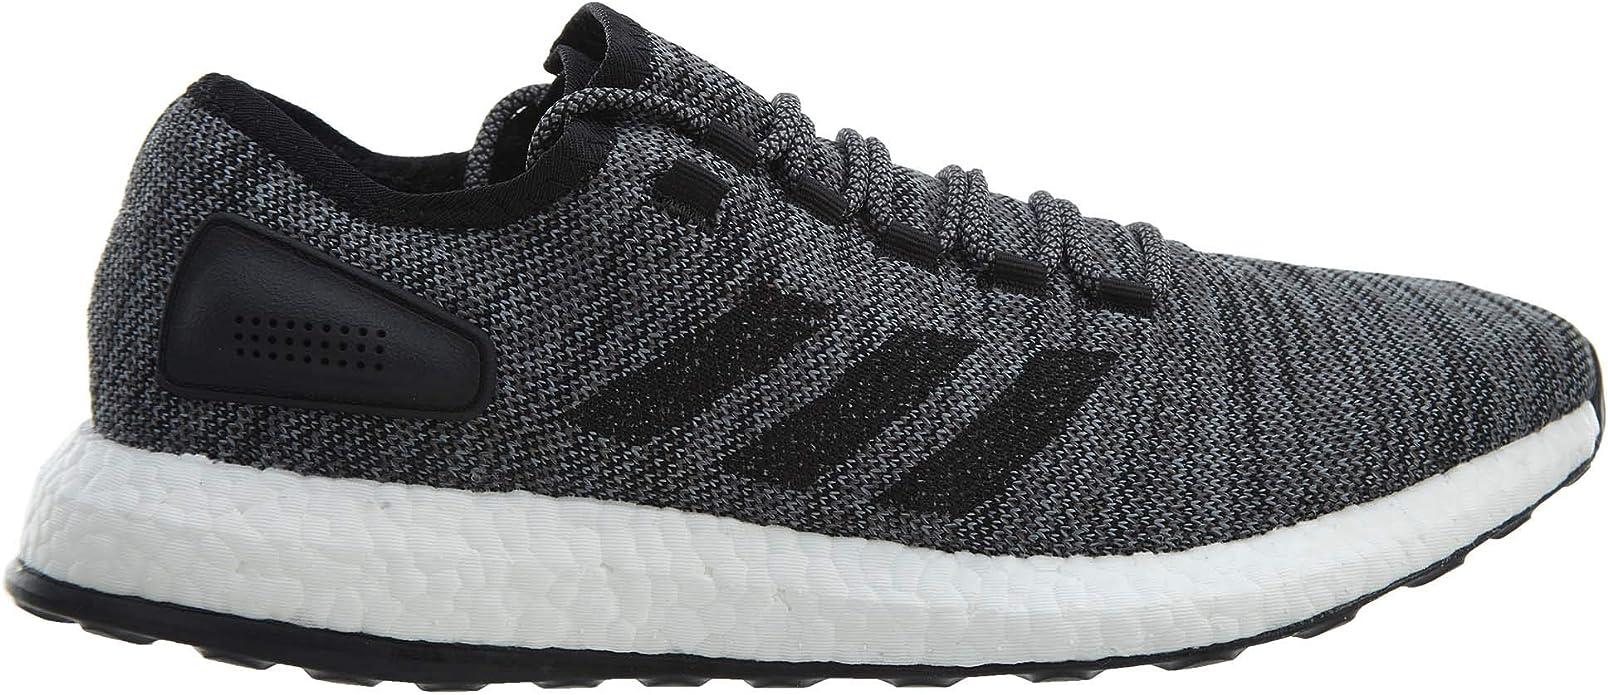 Hacer odio Equipo  Amazon.com | adidas Men's Pureboost ATR Running Shoe | Road Running